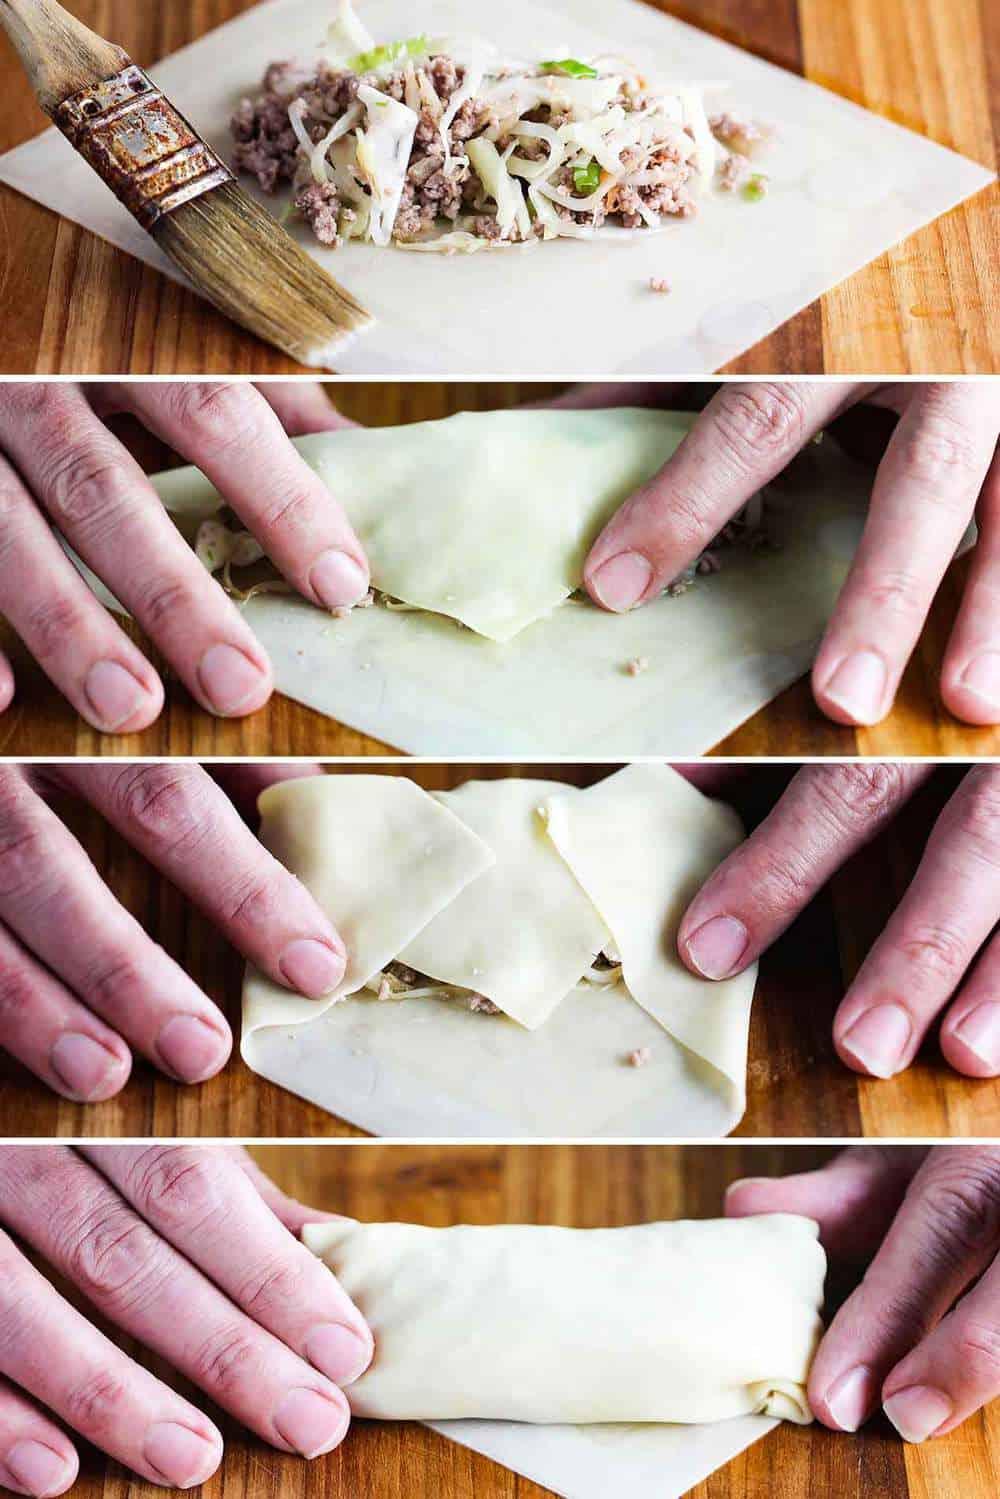 rolling homemade egg rolls is easy